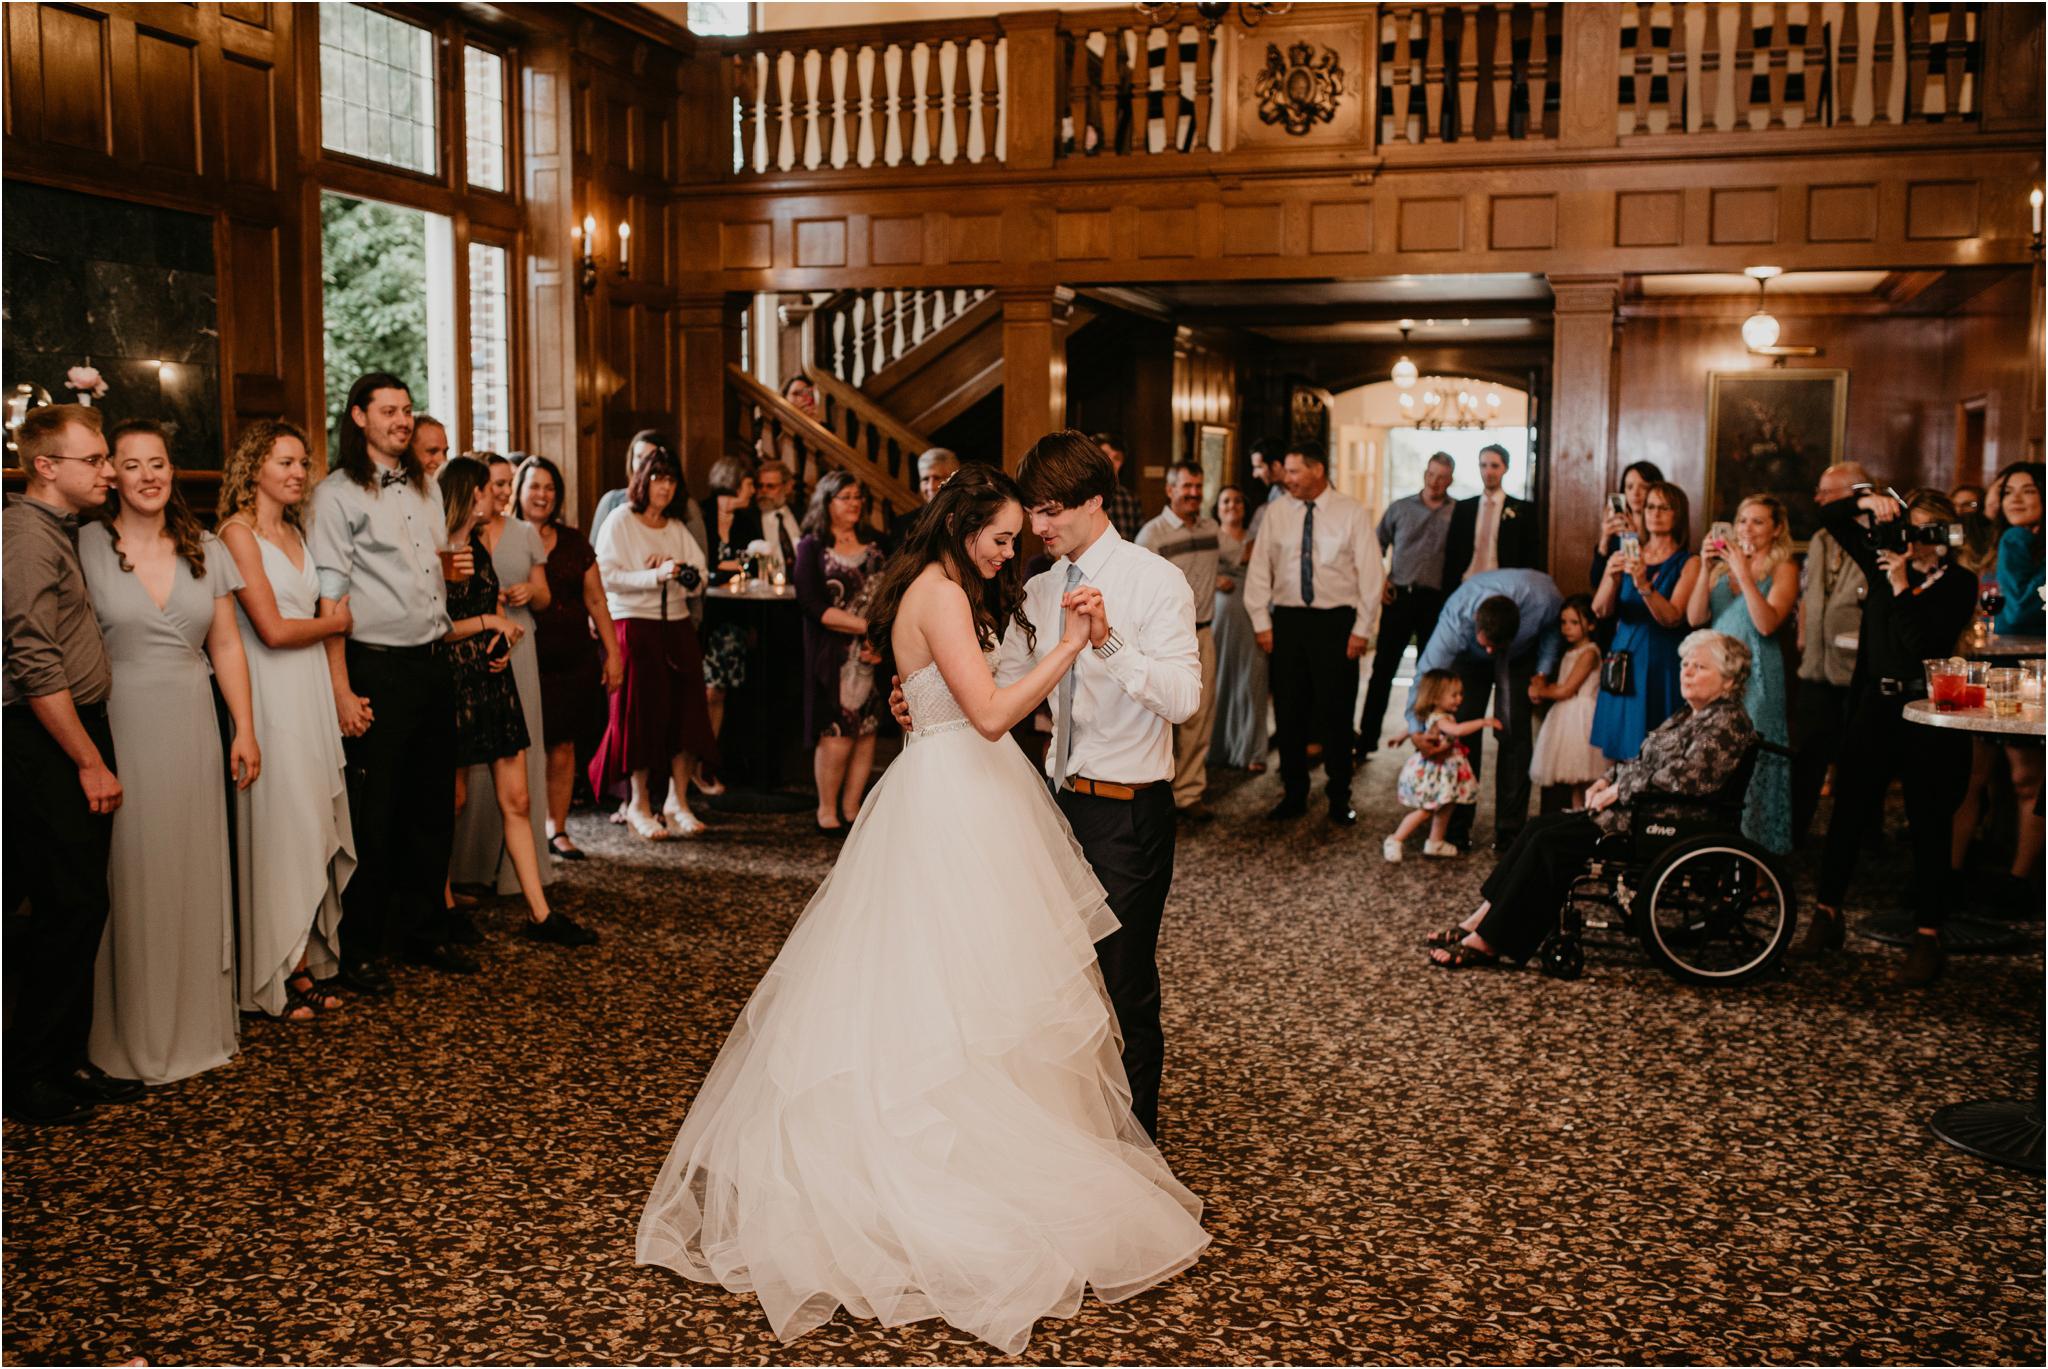 chance-and-ondrea-lairmont-manor-wedding-seattle-photographer-127.jpg